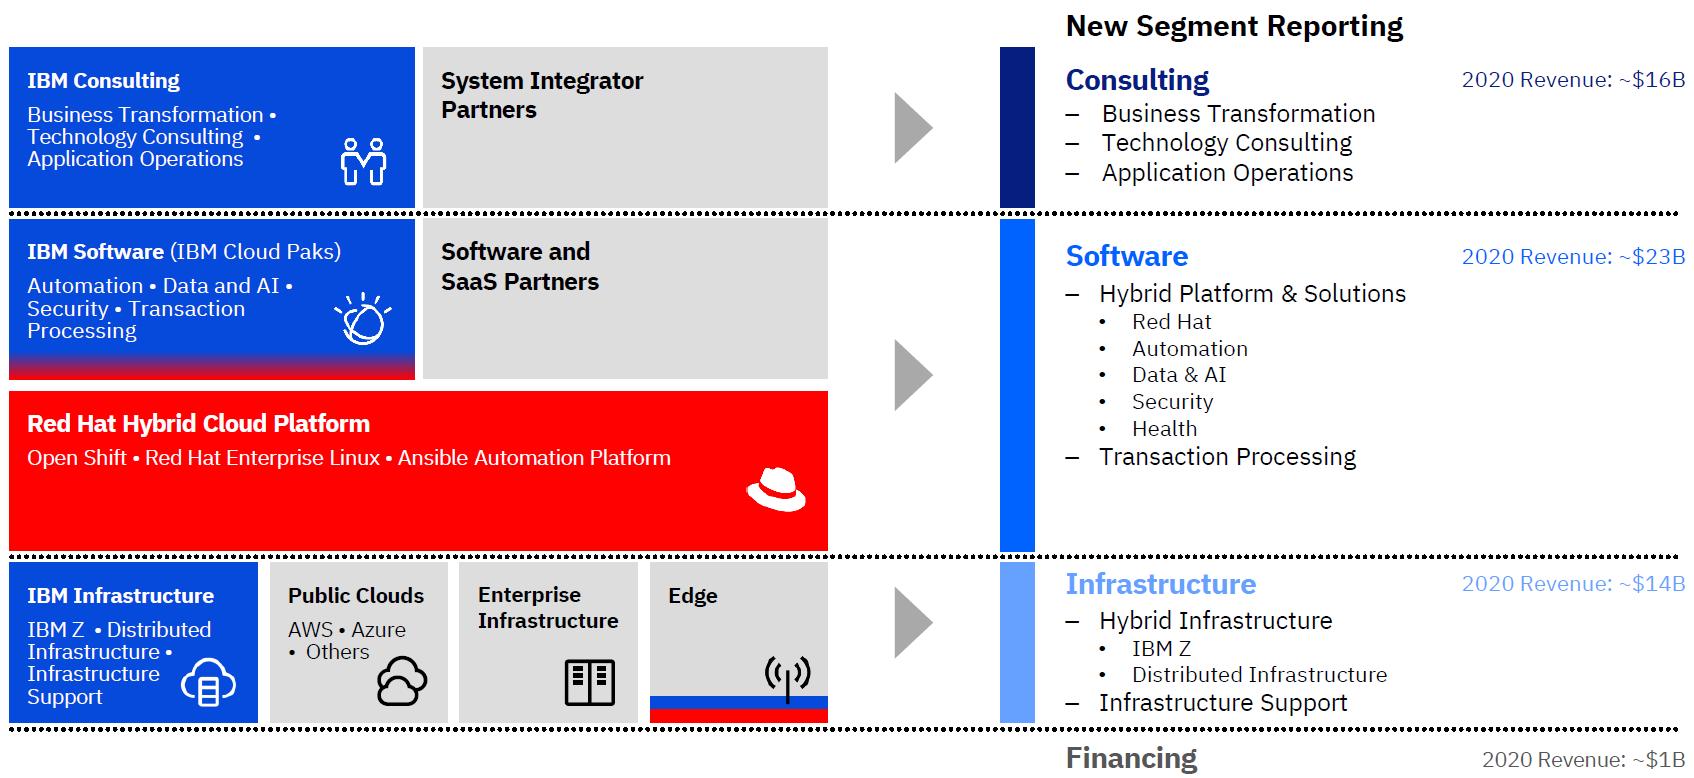 IBMのハイブリッドクラウド・プラットフォームと新しいセグメント分類、その2020年売上高